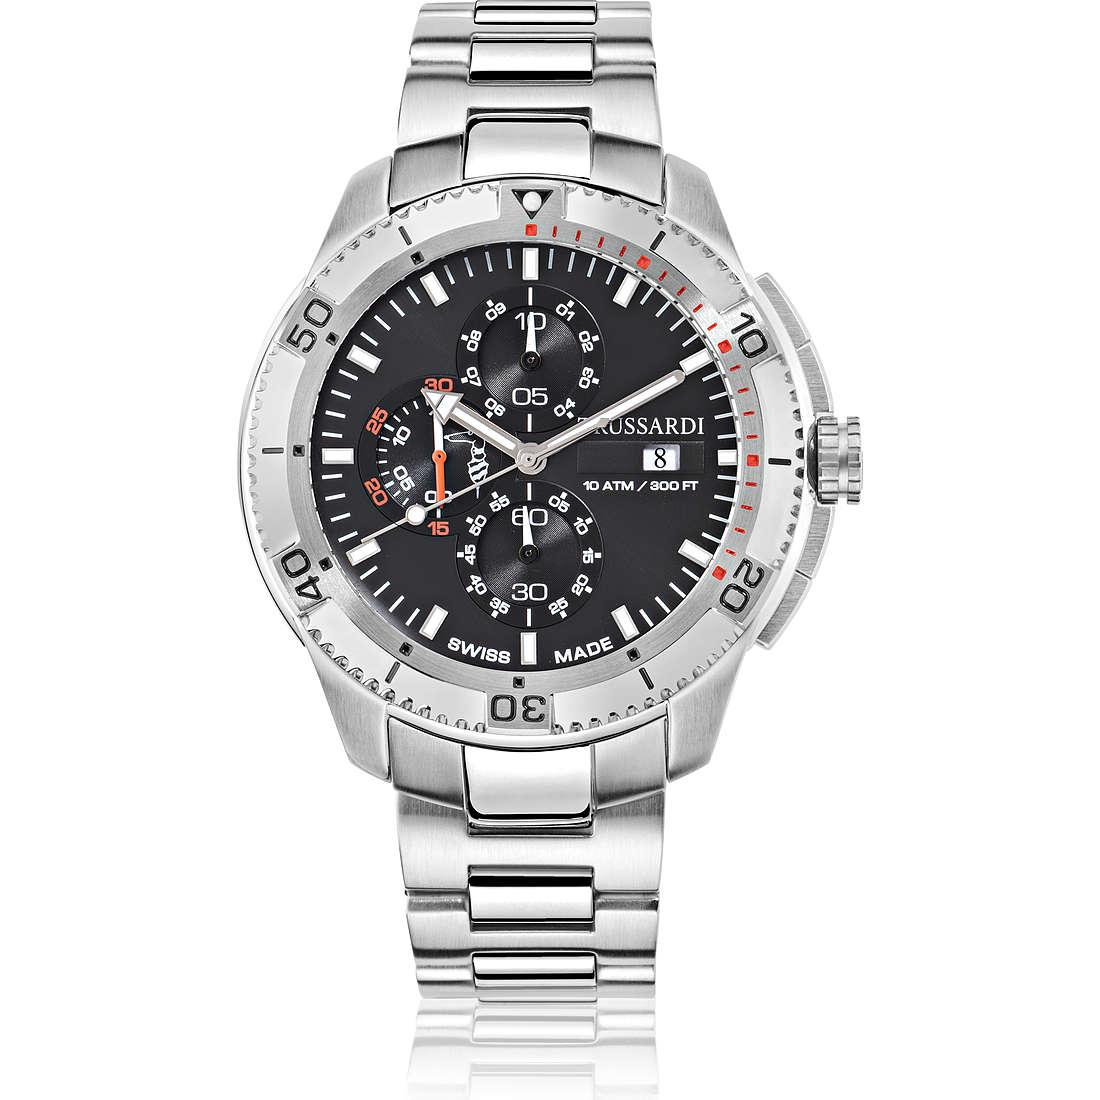 montre chronographe homme Trussardi Sportsman R2473601001